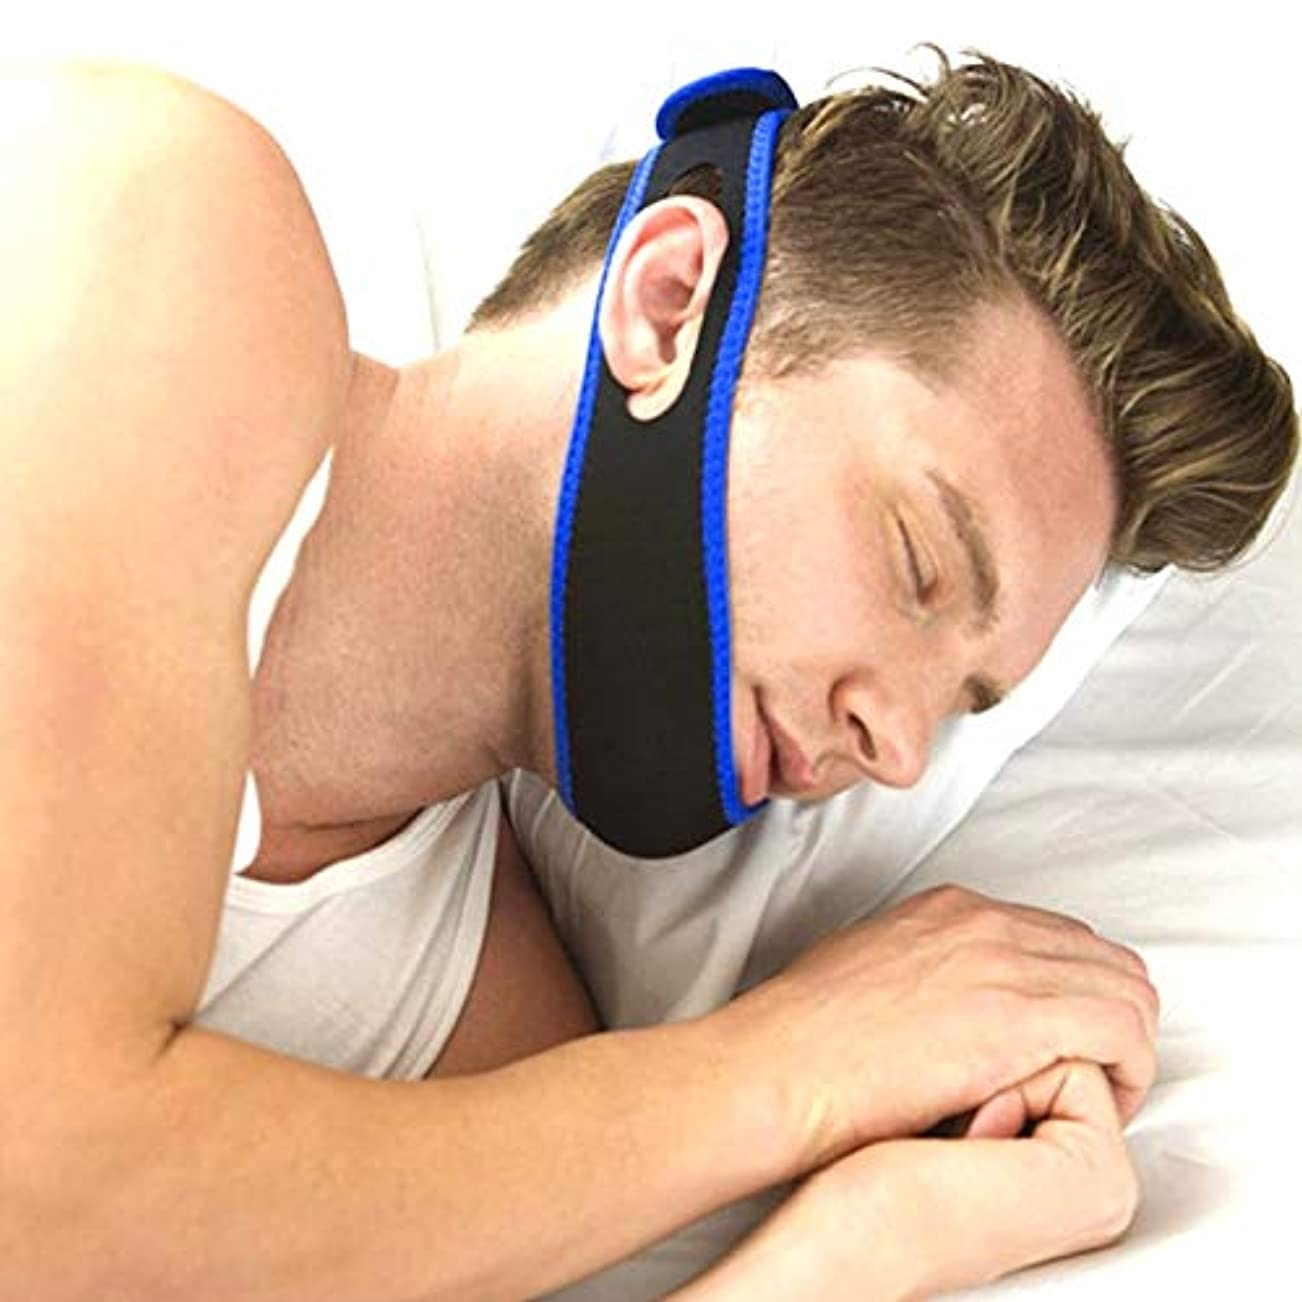 NOTE 抗いびき鼻清浄機鼻拡張器息をしやすいAntiSnoreチンストラップ抗いびきマウスピースストップいびきコーン渋滞補助